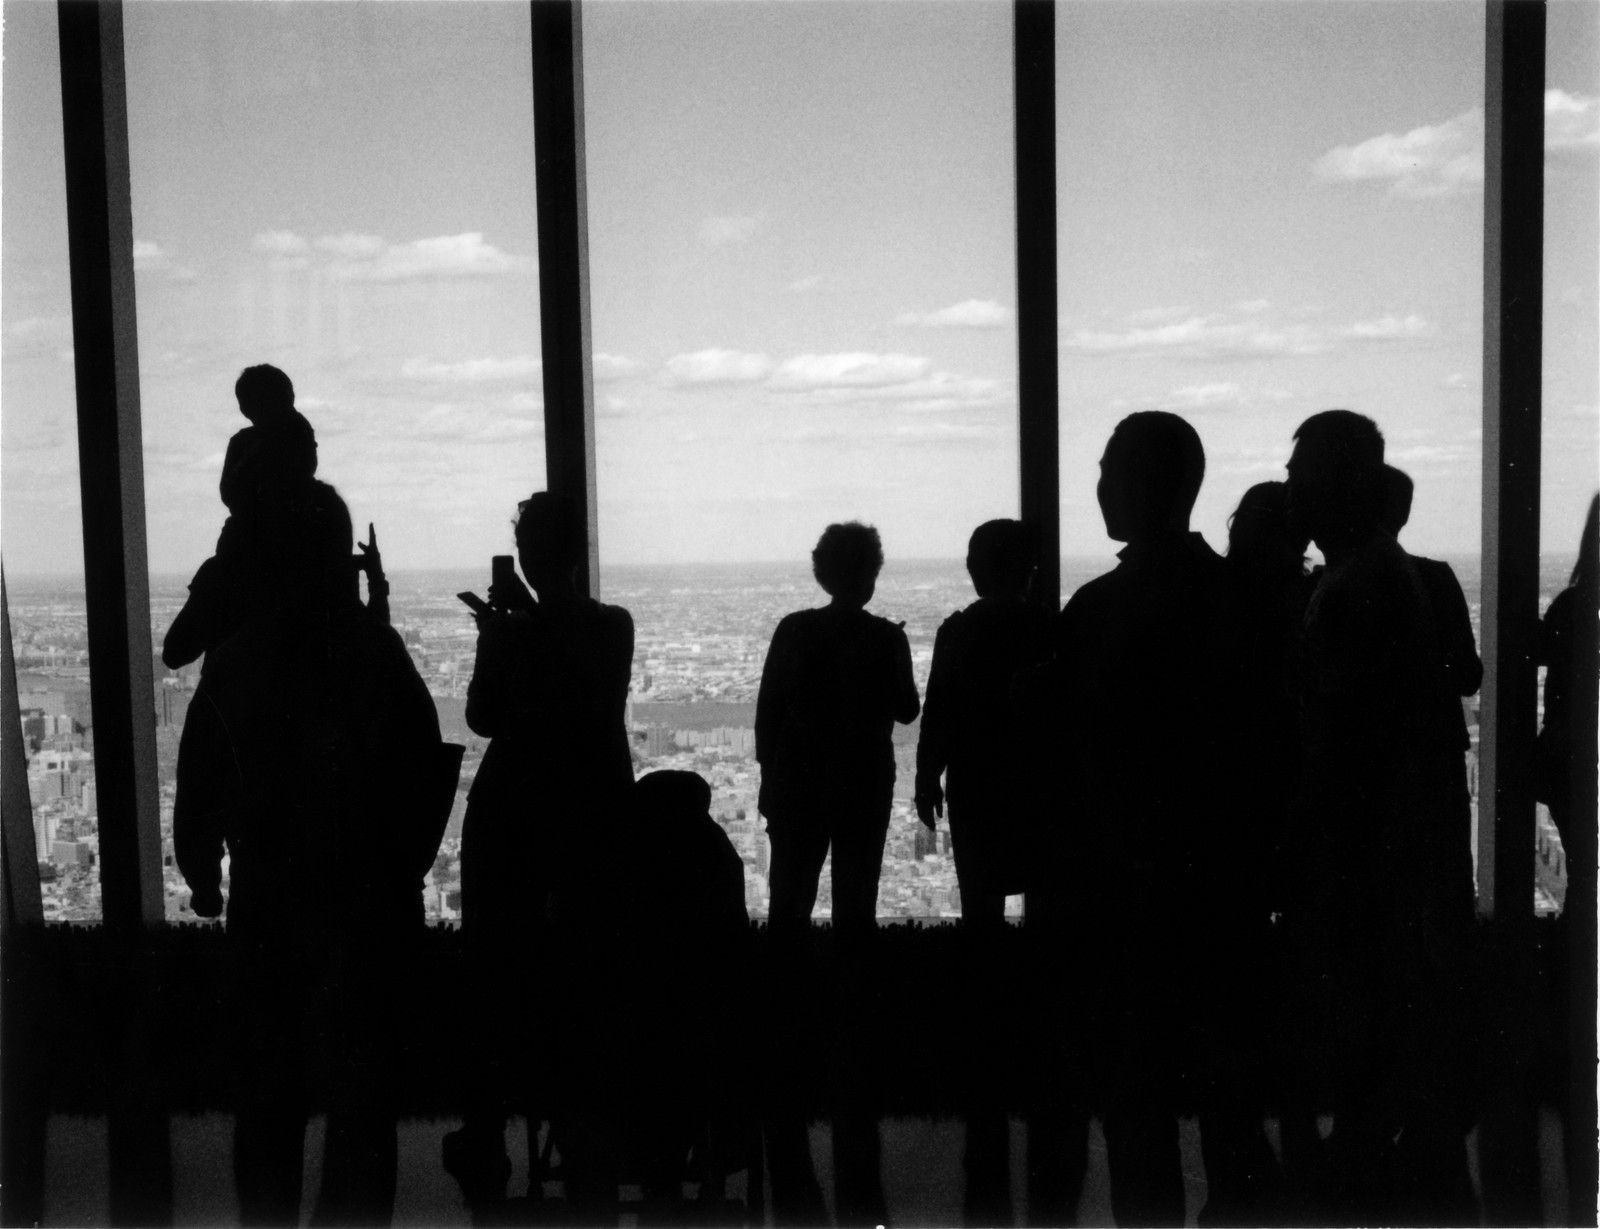 Observers' Paradox